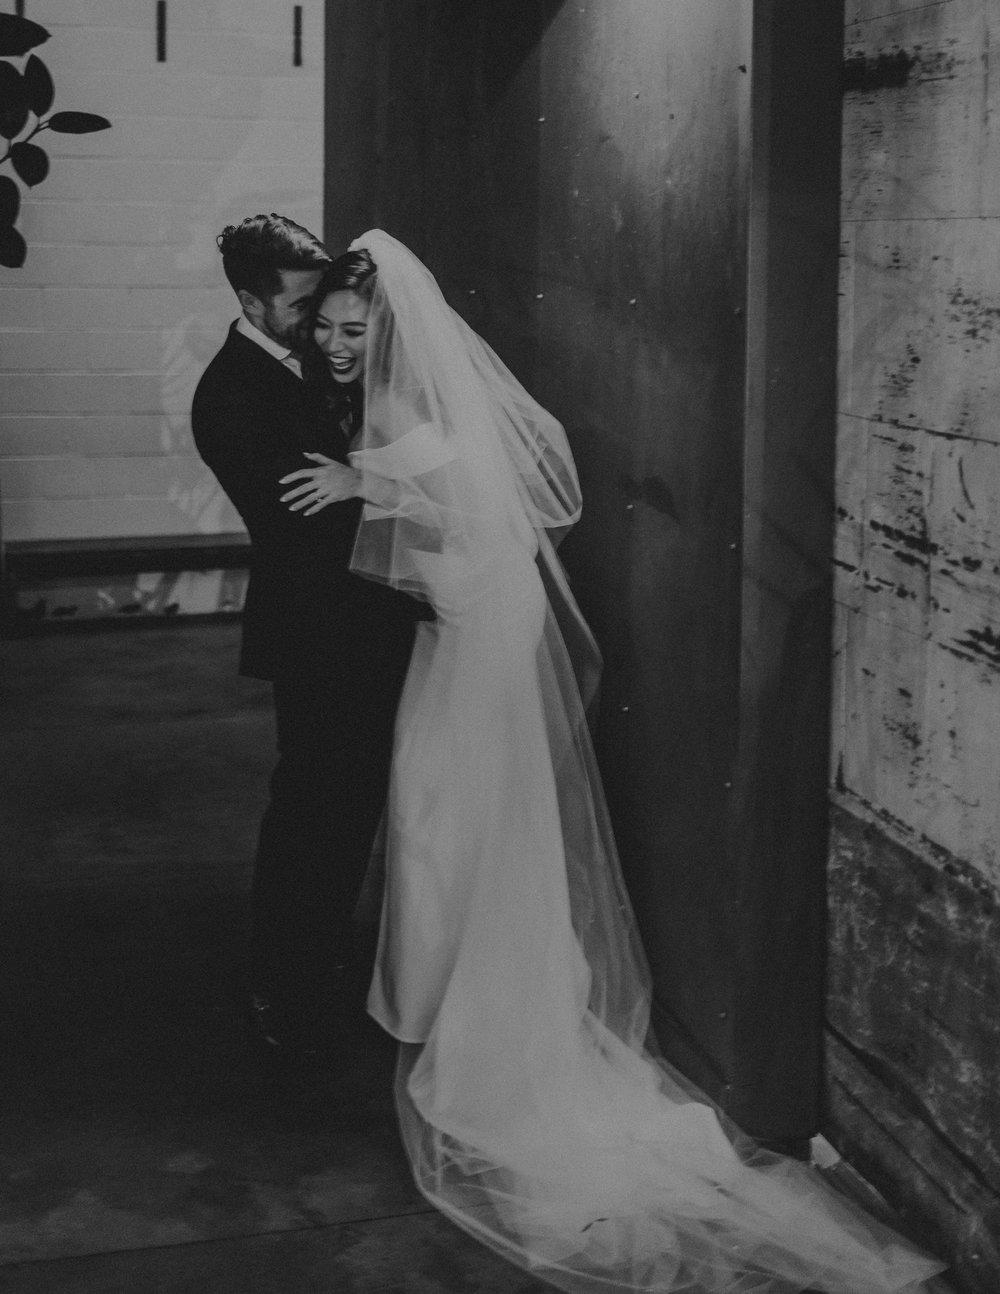 Wedding Photo LA - wedding photographer in los angeles - millwick wedding venue -isaiahandtaylor.com-110.jpg